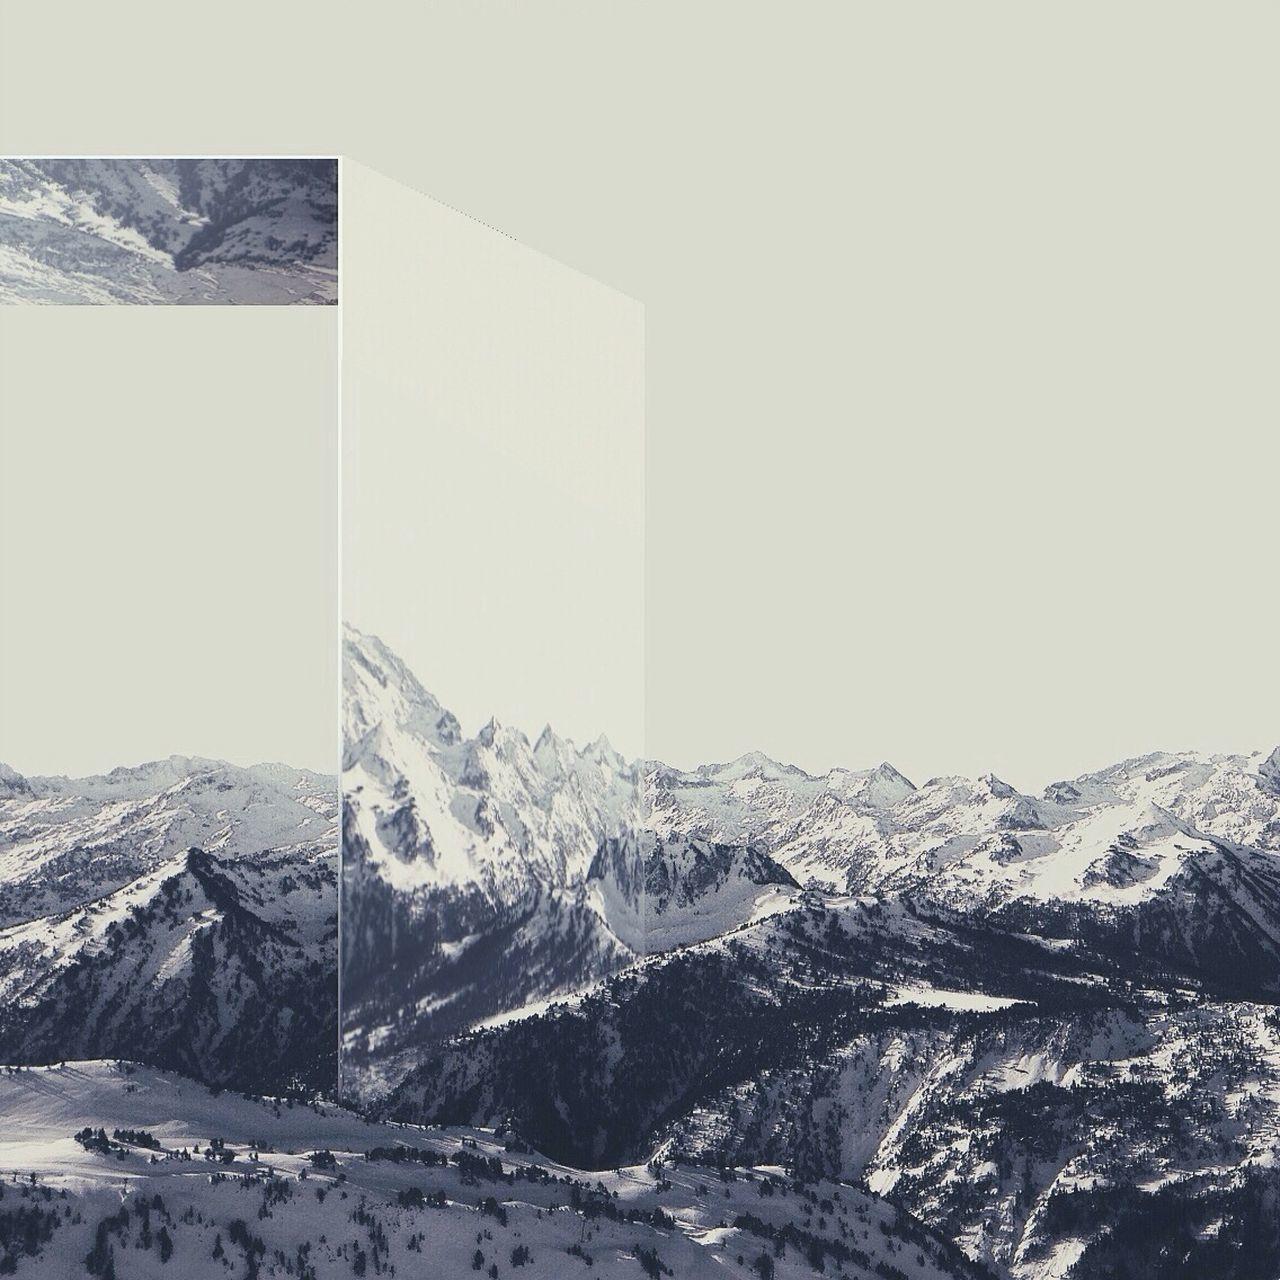 snow, winter, cold temperature, mountain, no people